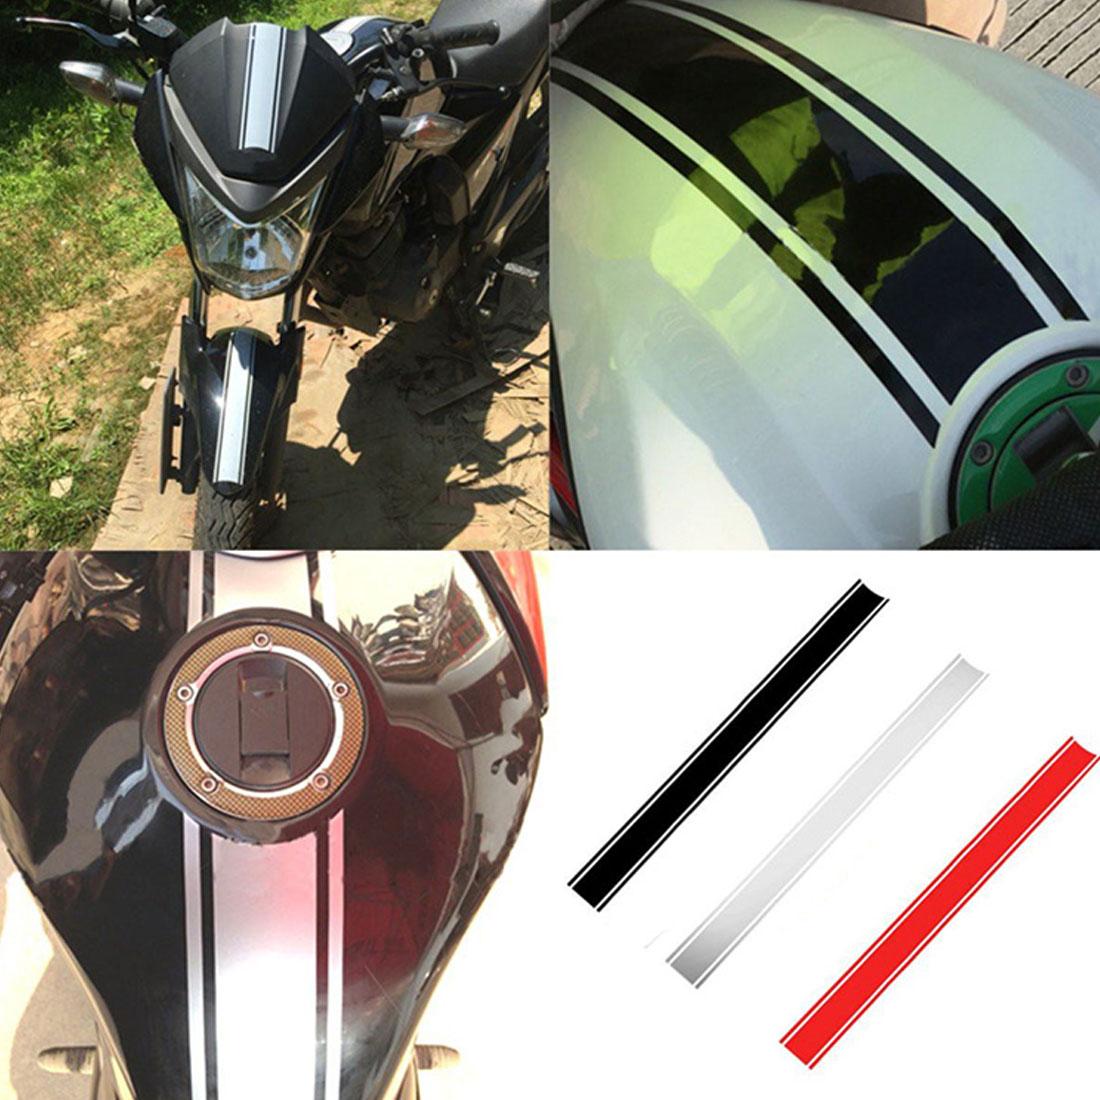 50 x 4.5 cm Motorcycle Body Sticker Tape Stripe Car Decal Strip Vinyl Racer Moto